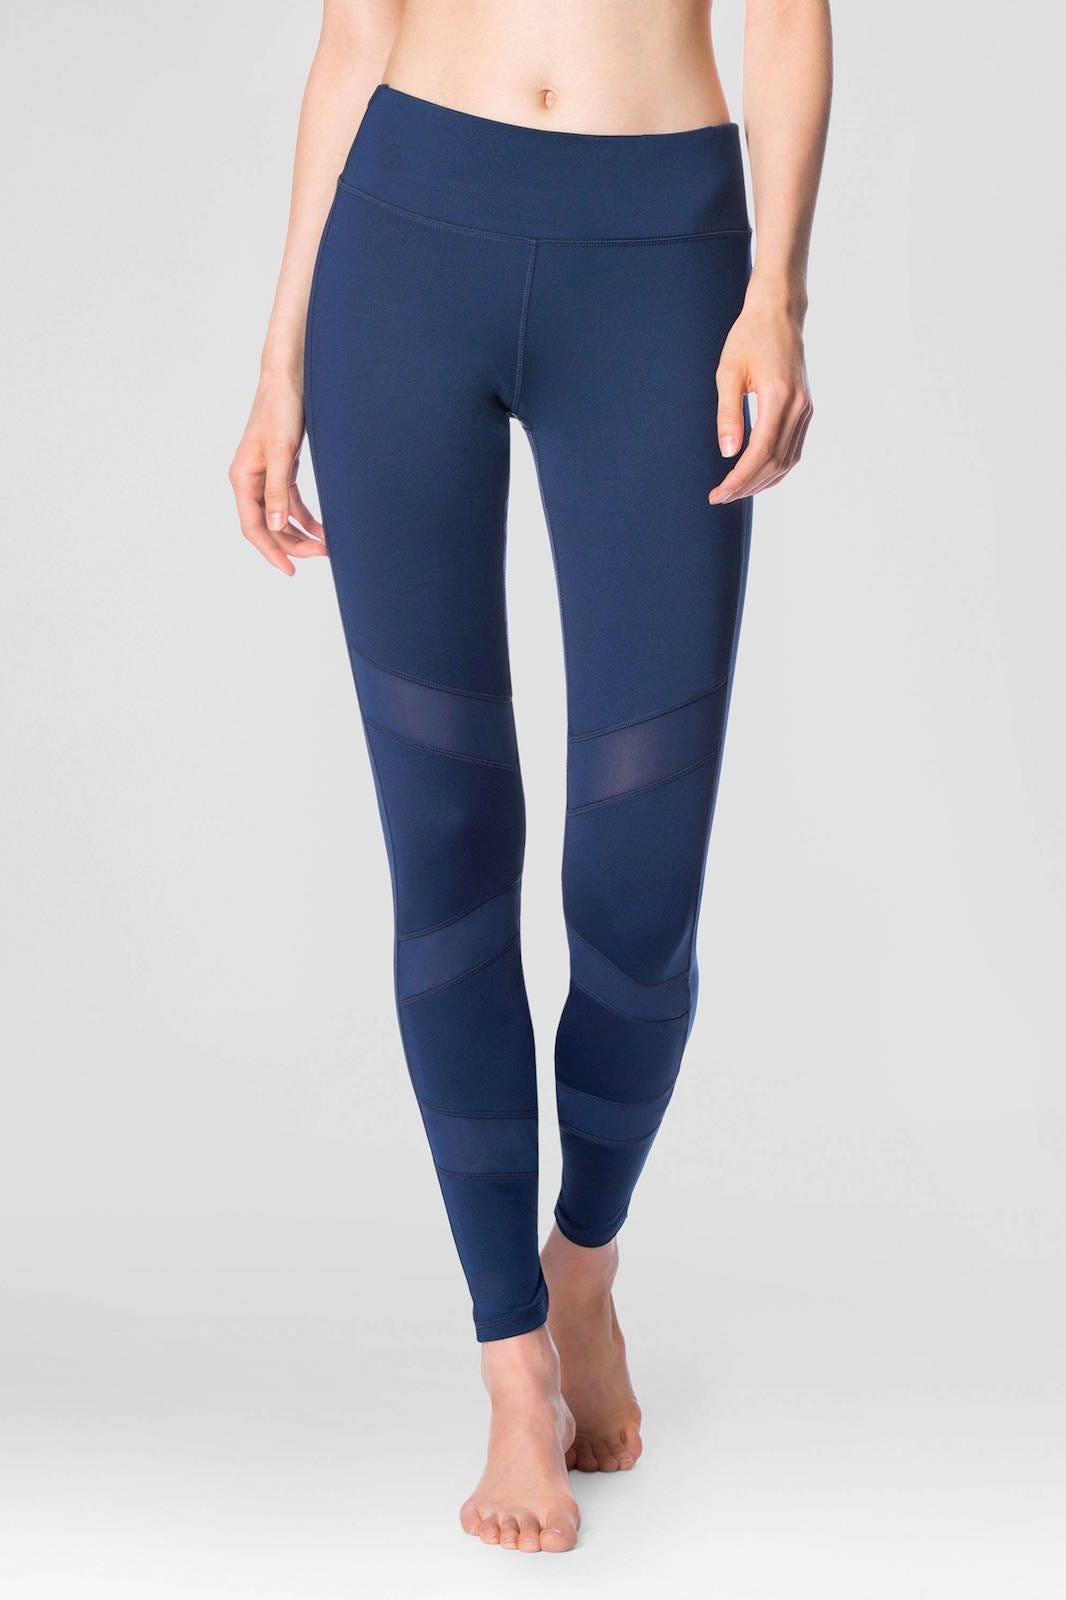 Best Yoga Pants, Yogi Leggings - Cute Workout Clothes